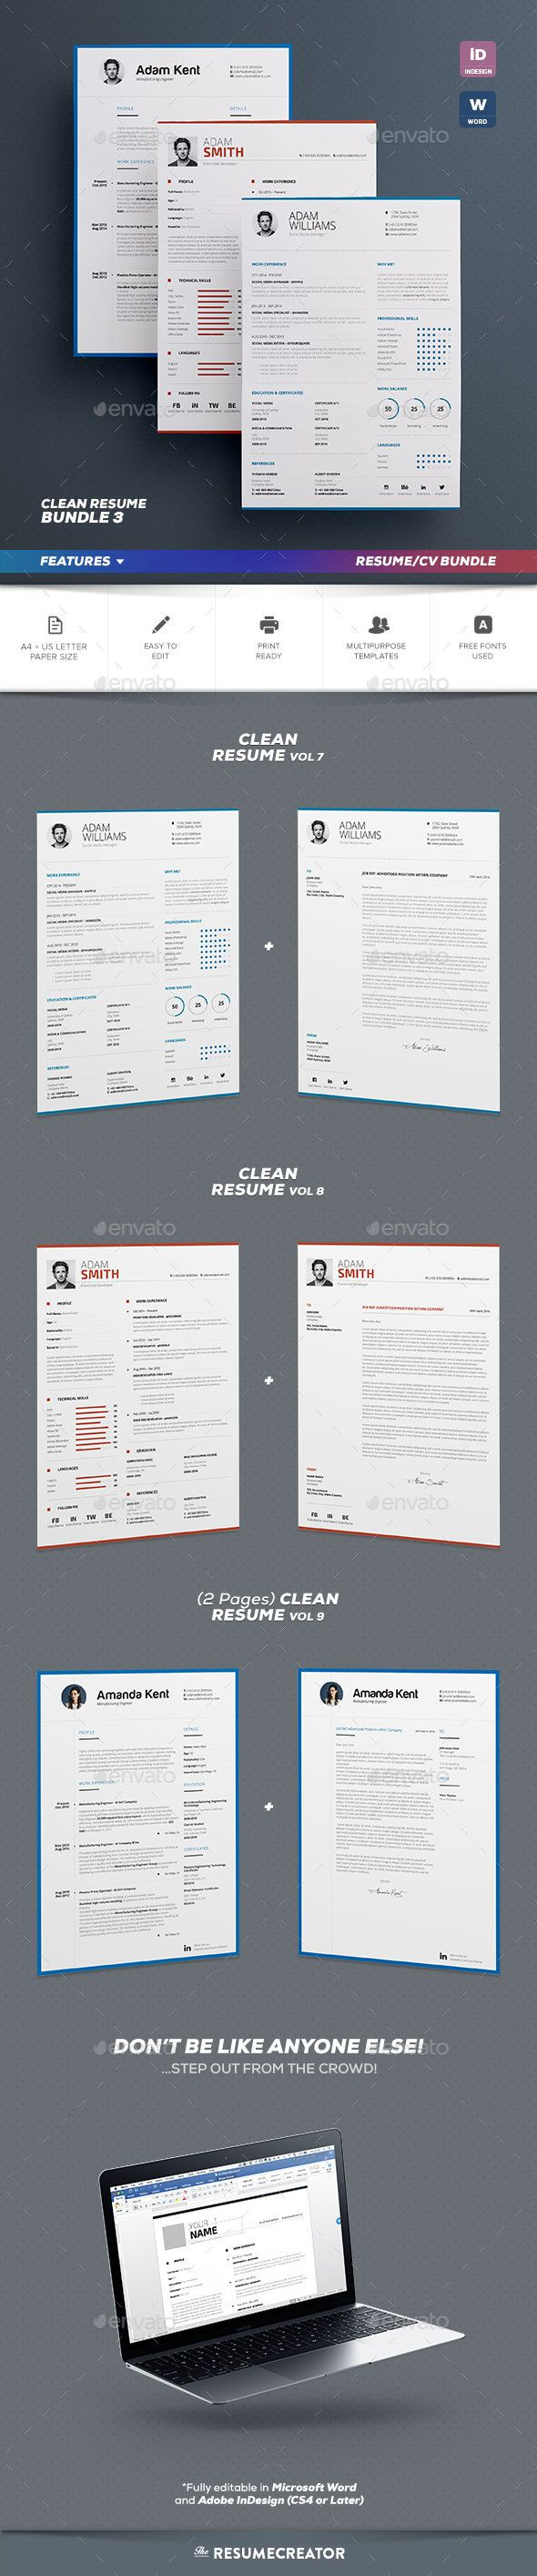 Microsoft Word Templates Cv%0A Clean Resume Cv Bundle Vol